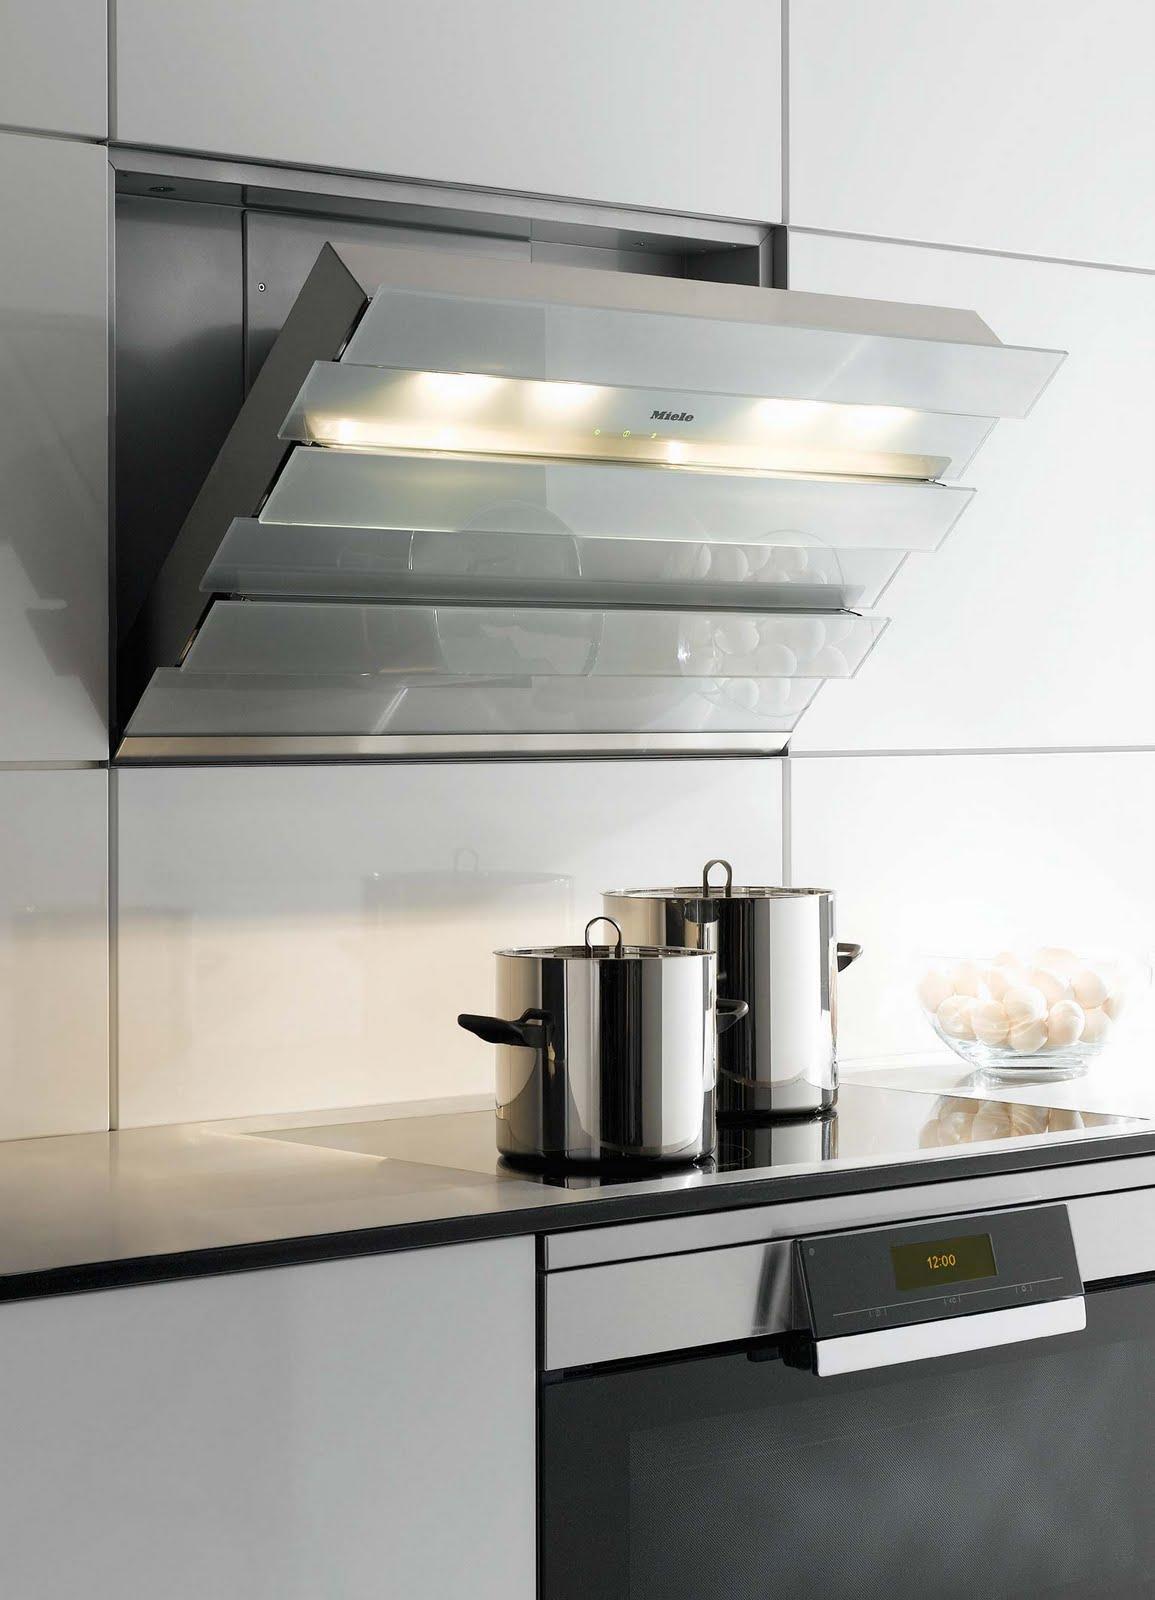 5 Discreet Range Hood Options Mecc Interiors Design Bites